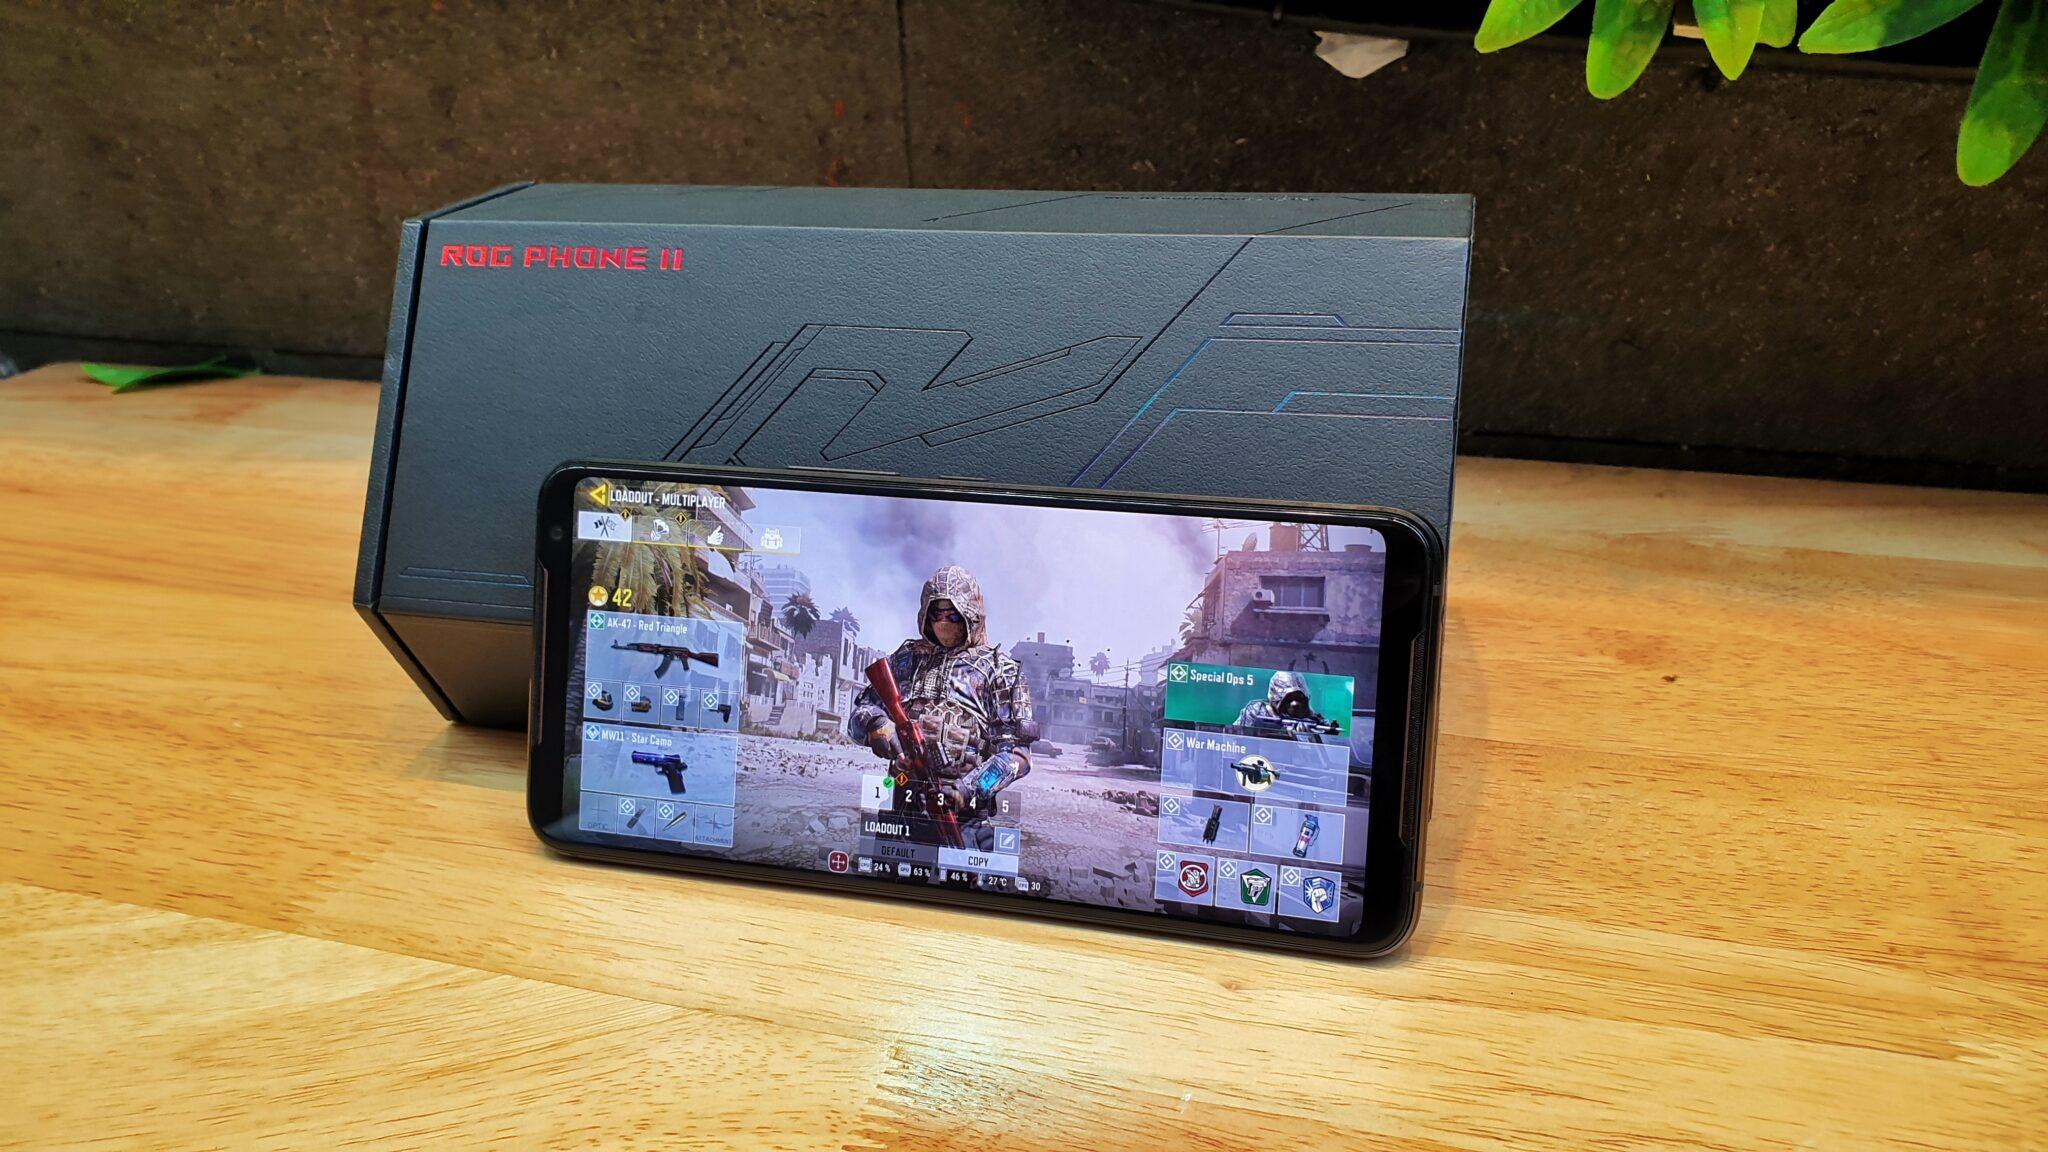 ROG Phone 2 gaming